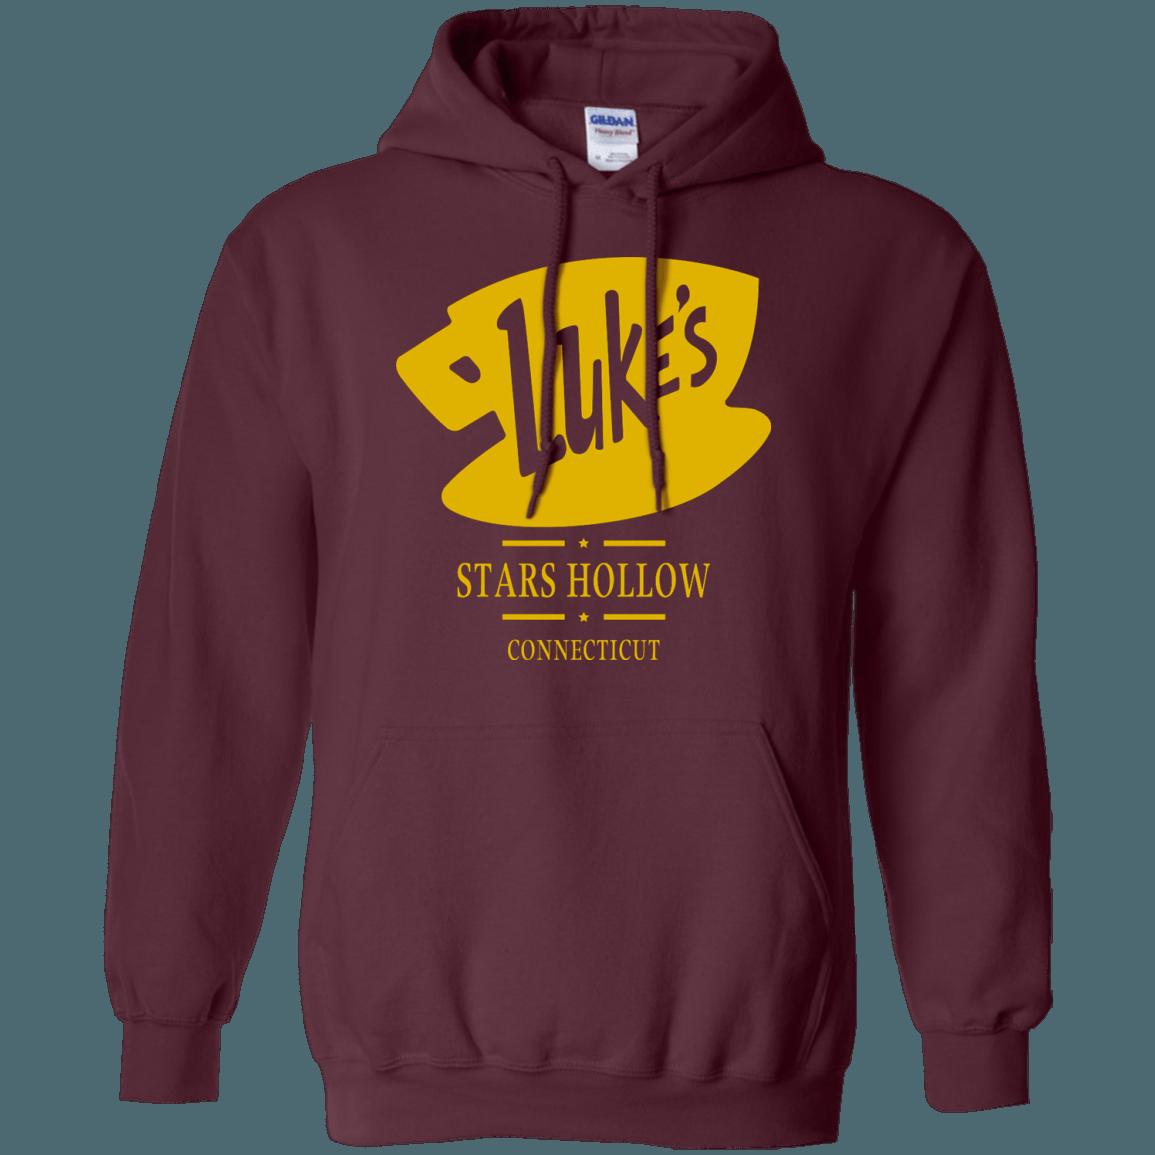 e3536223c Gilmore Girls Luke's Diner Shirt - Stars Hollow Connecticut